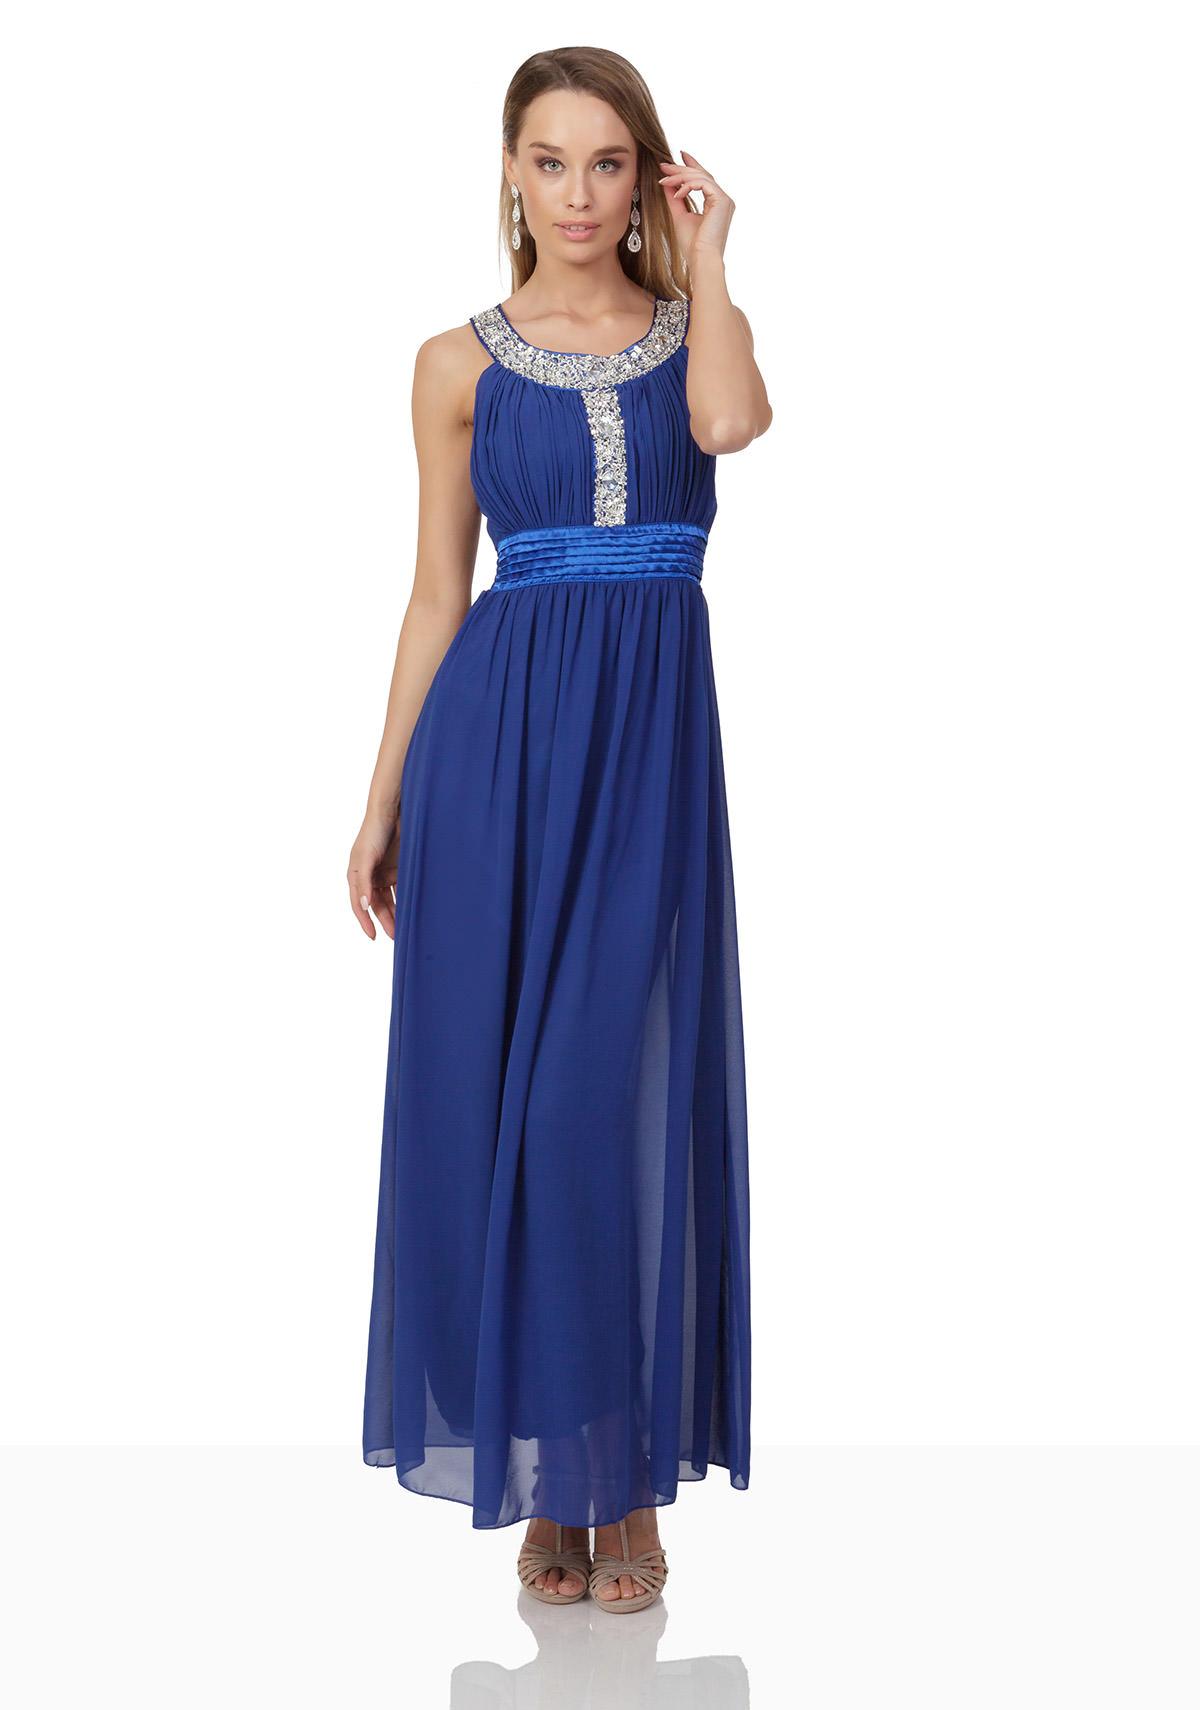 Langes Abendkleid in Blau   bei VIP Dress shoppen